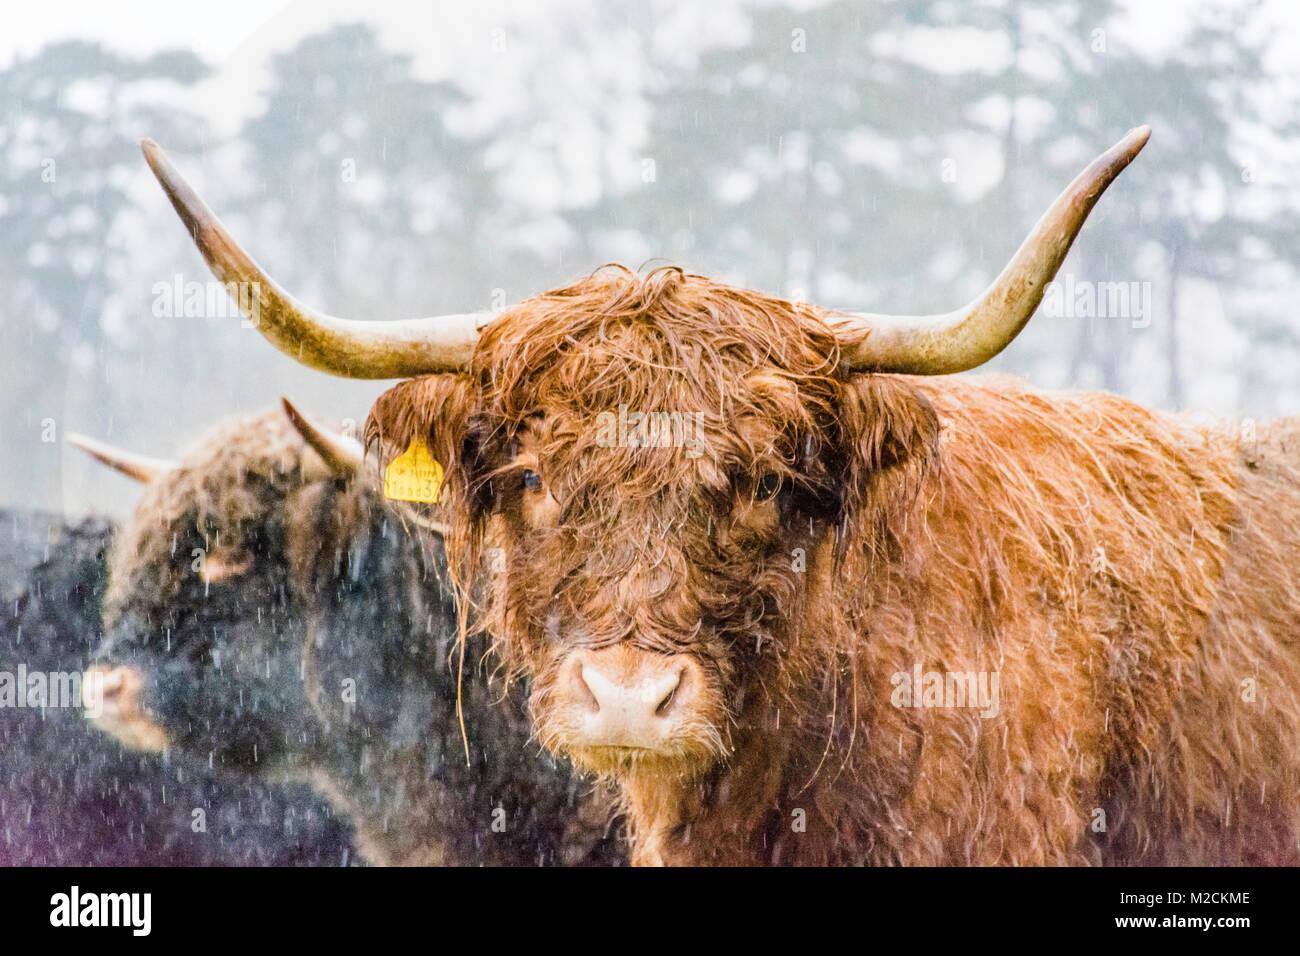 Ein Highland Kuh im Winter Stockfoto